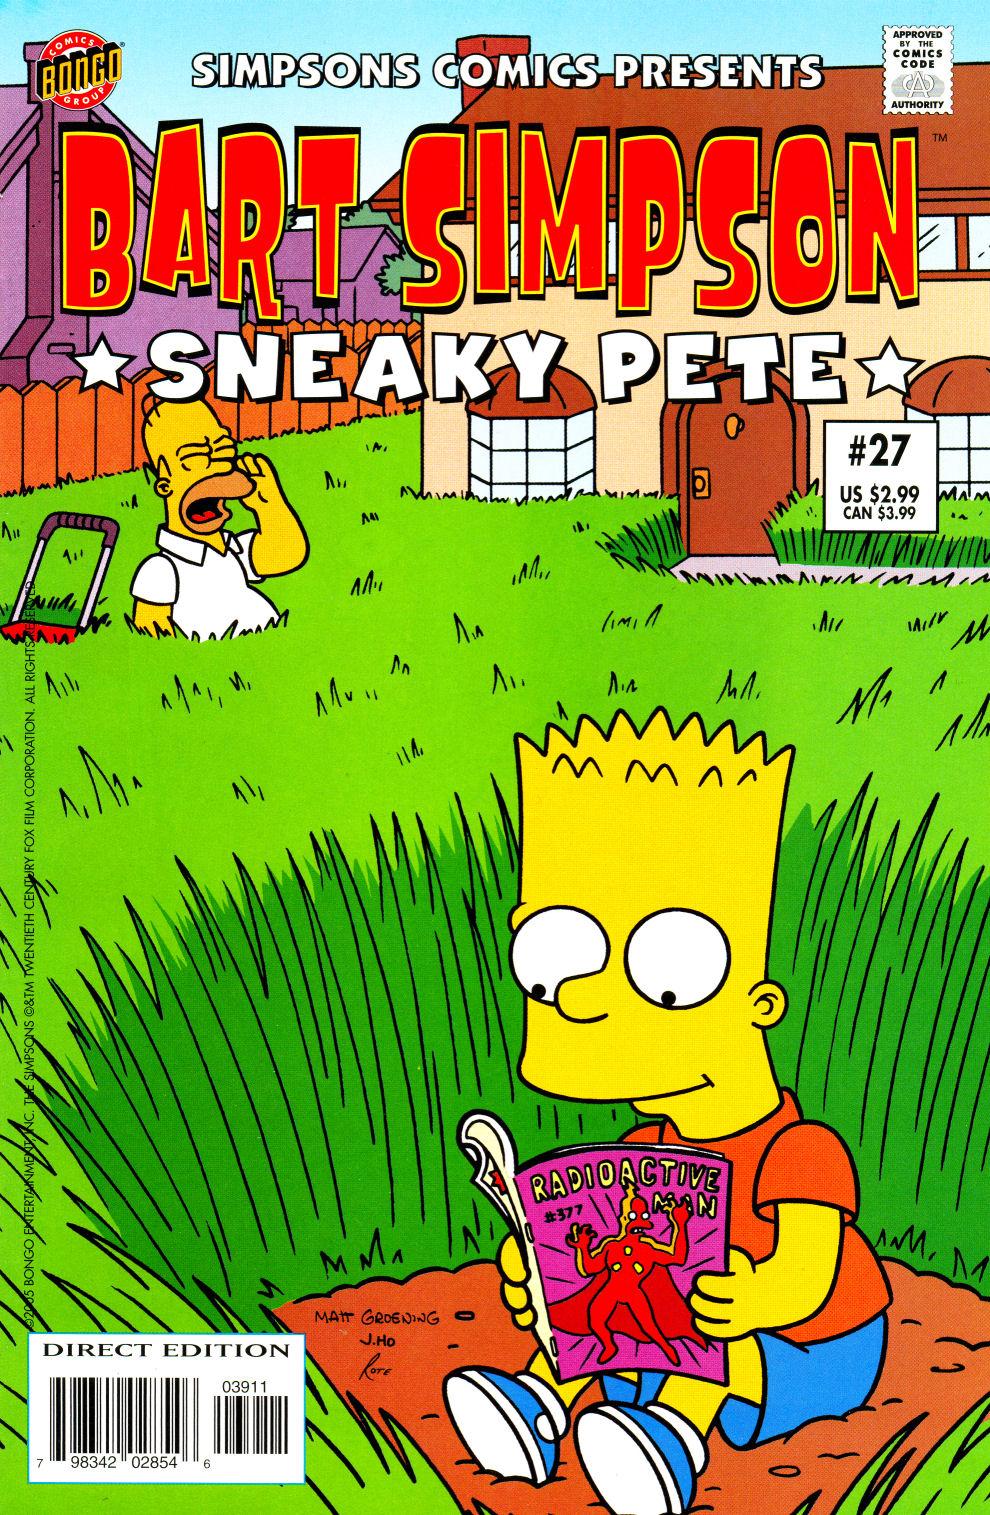 Simpsons Comics Presents Bart Simpson 27 Page 1